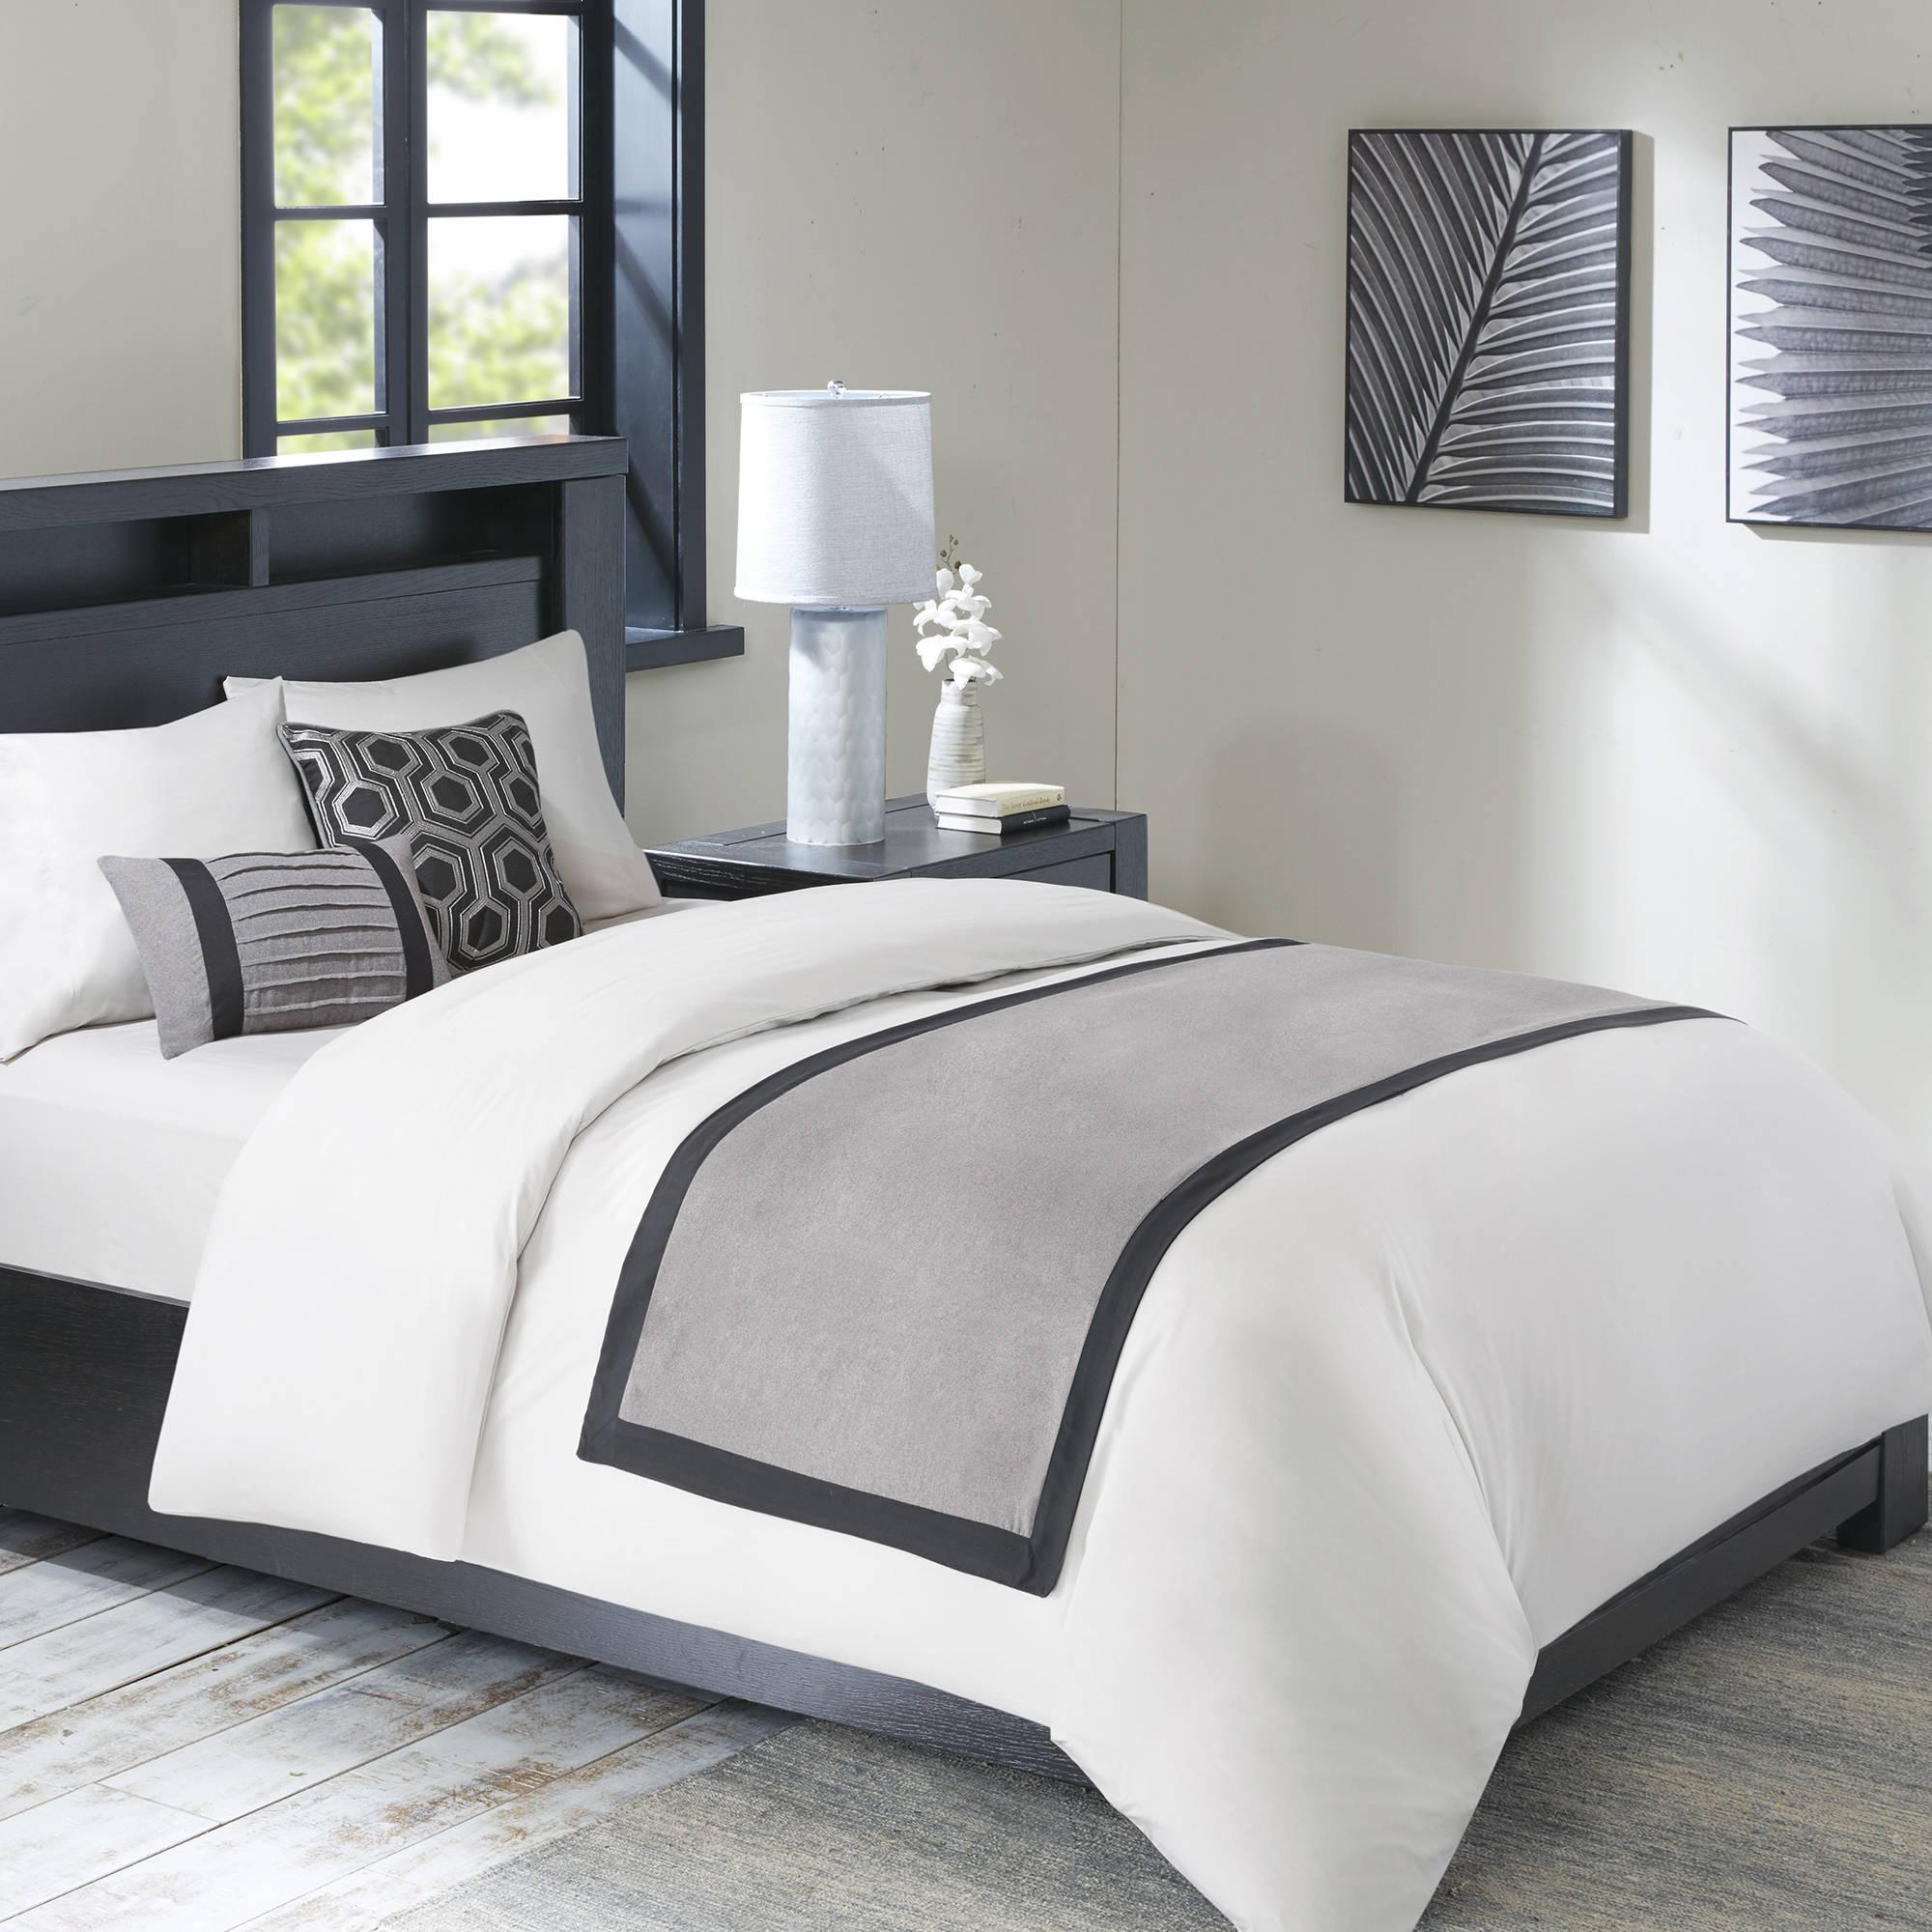 Home Essence Parker Bedscarf and Pillow Set